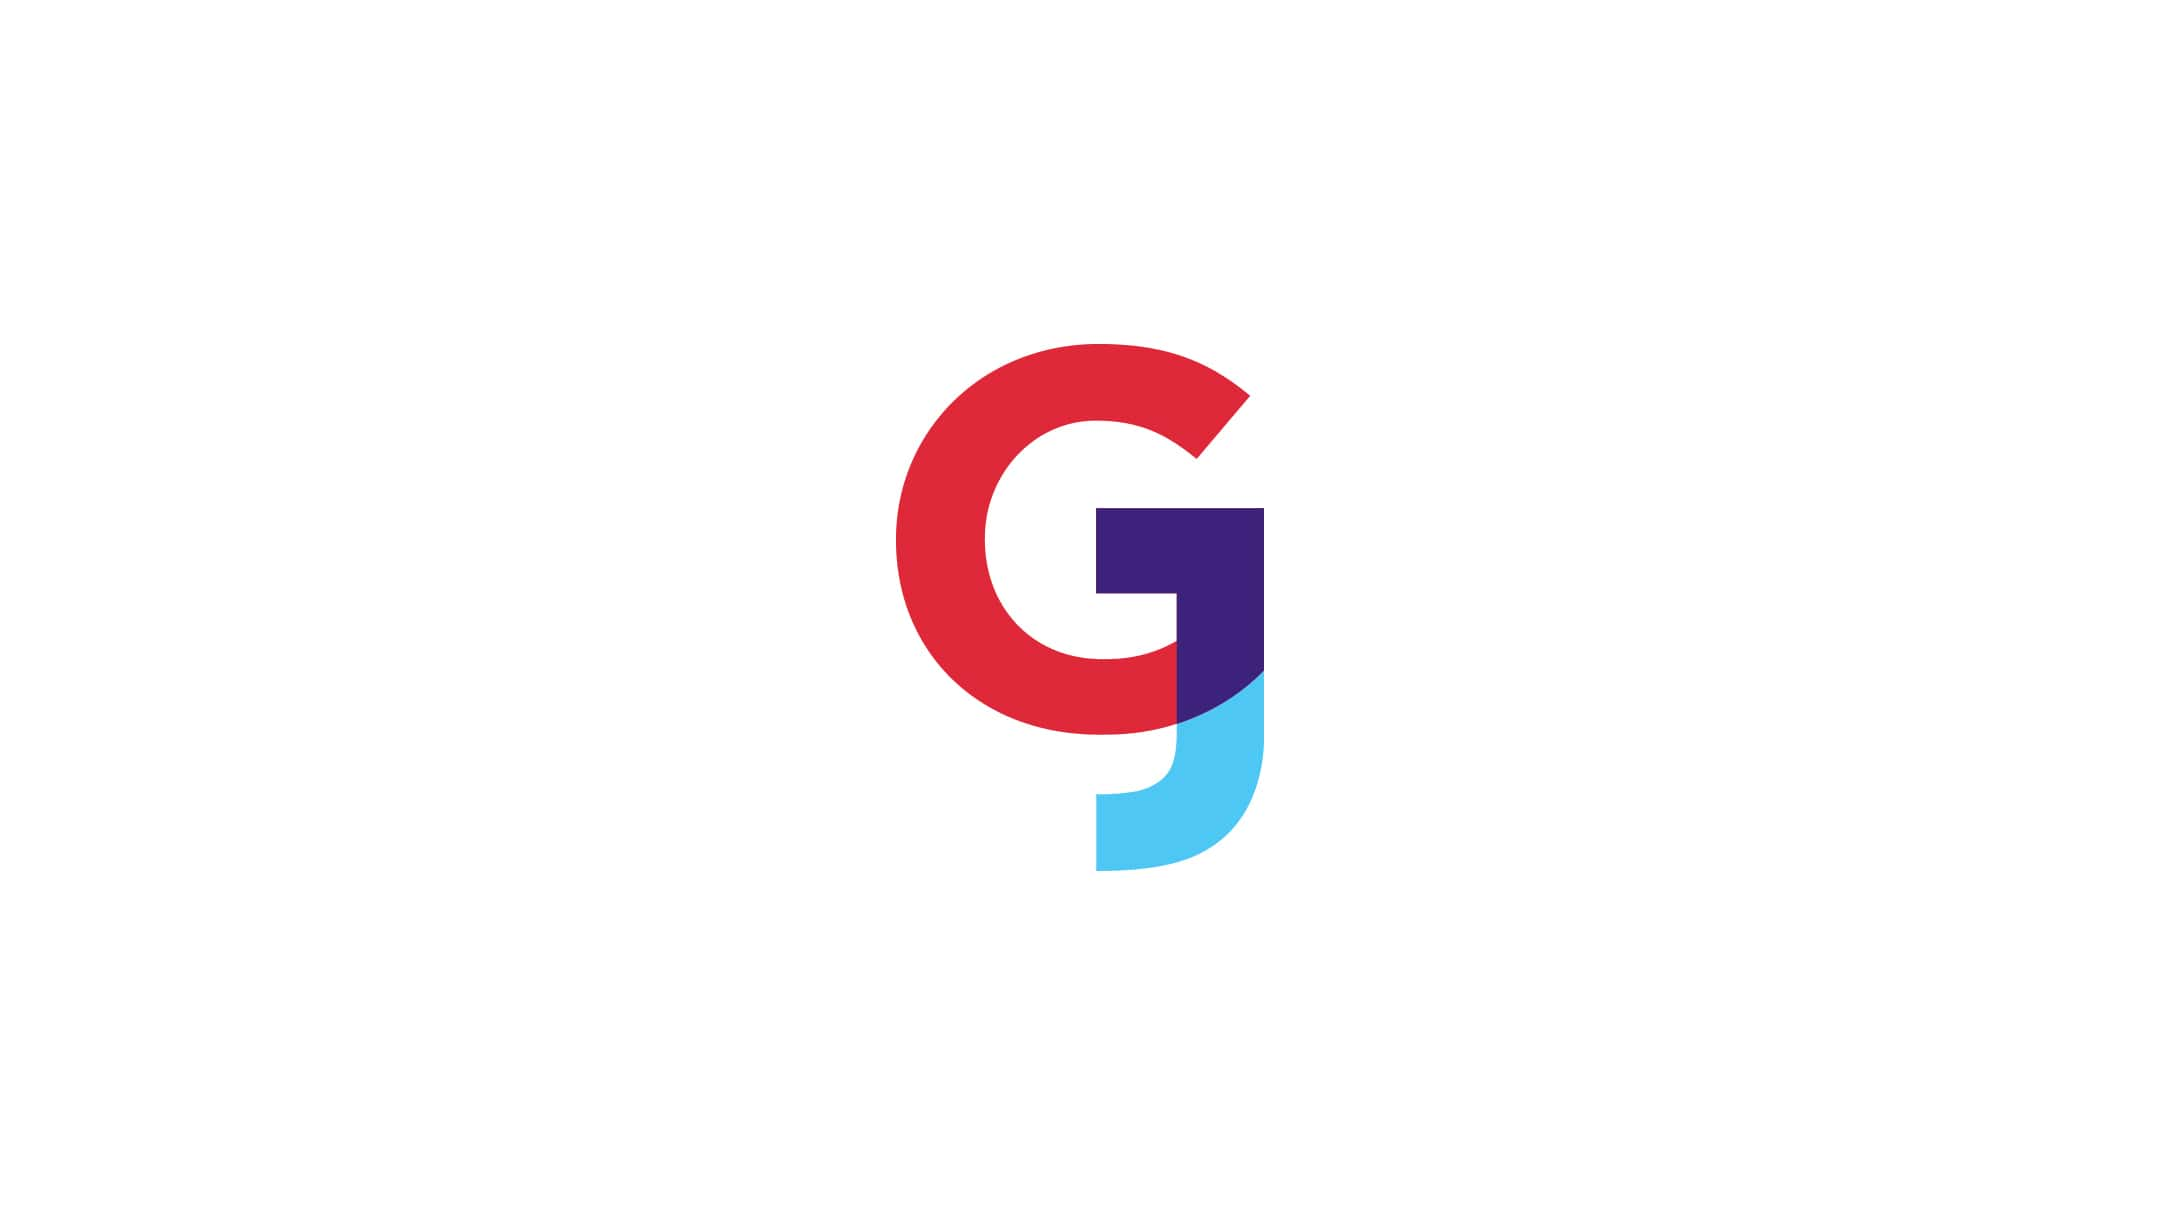 Gary Johnson spec campaign logo design